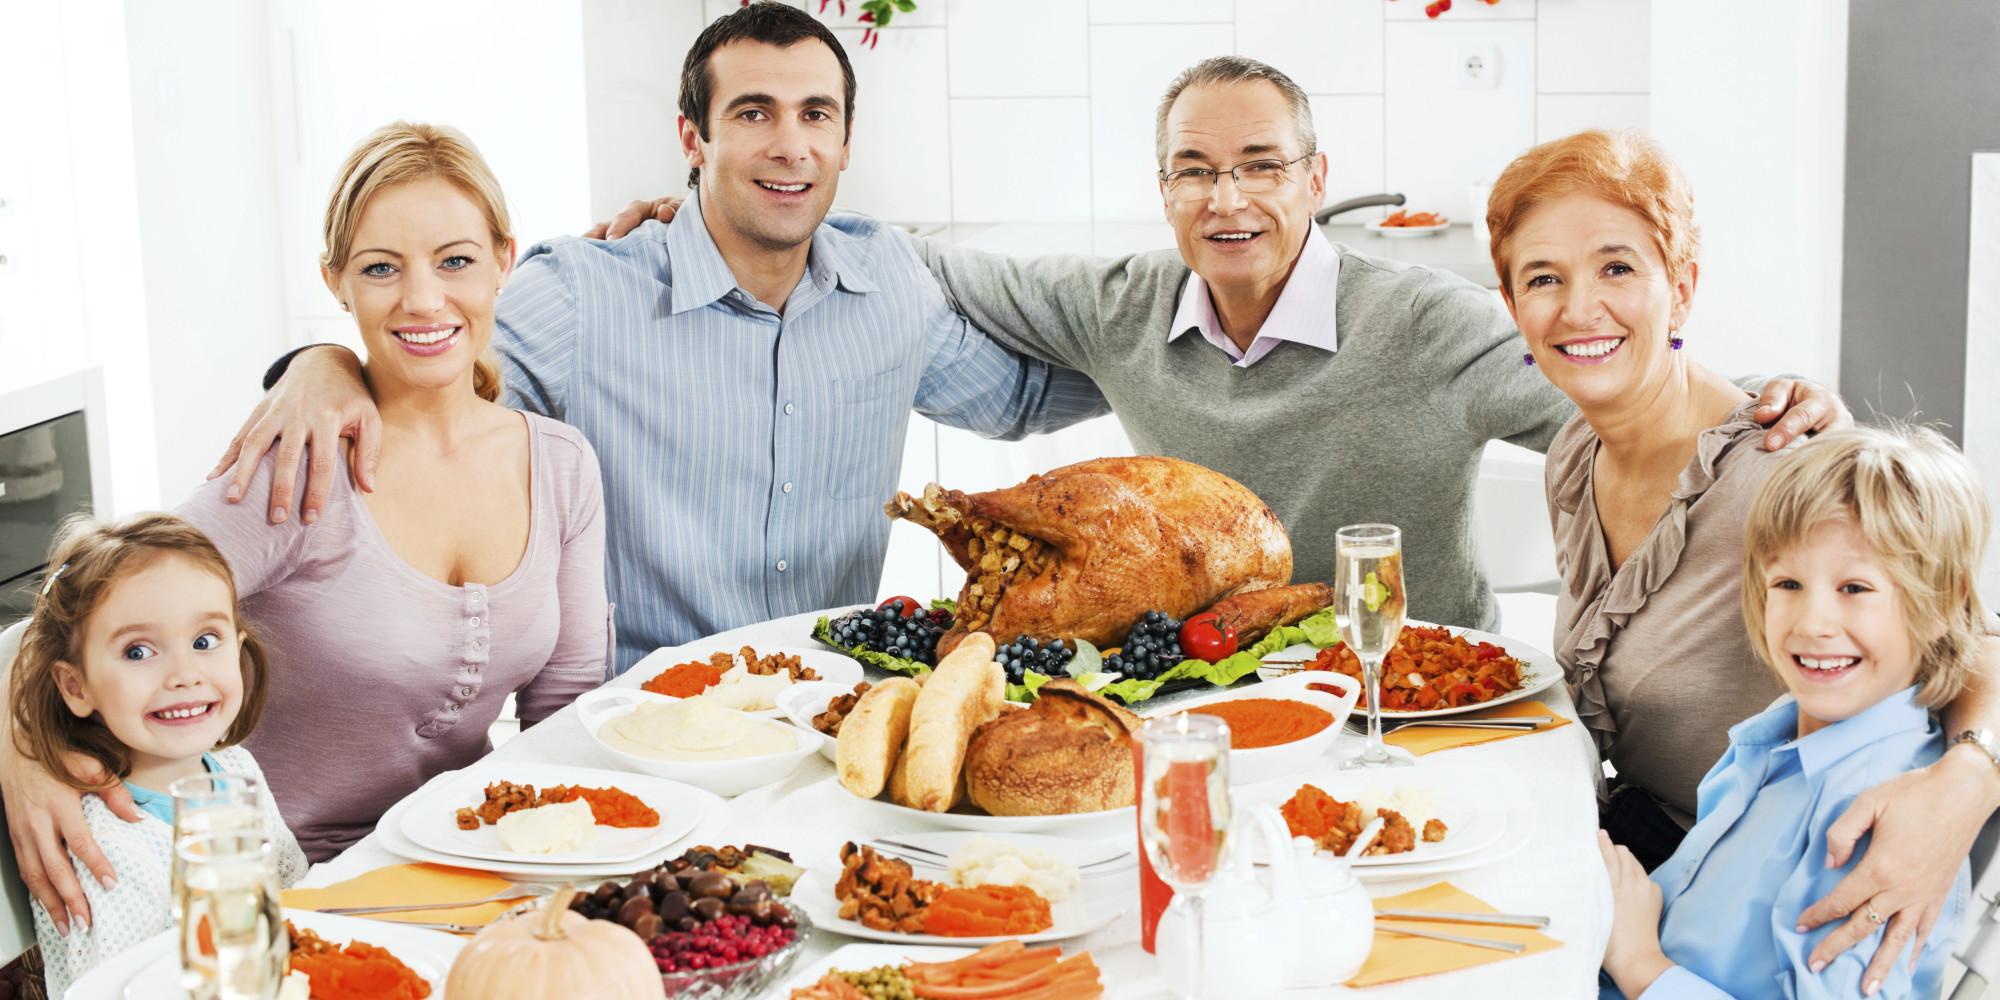 Thanksgiving Family Dinner  The Thanksgiving Dinner Argument Generator Is Just What